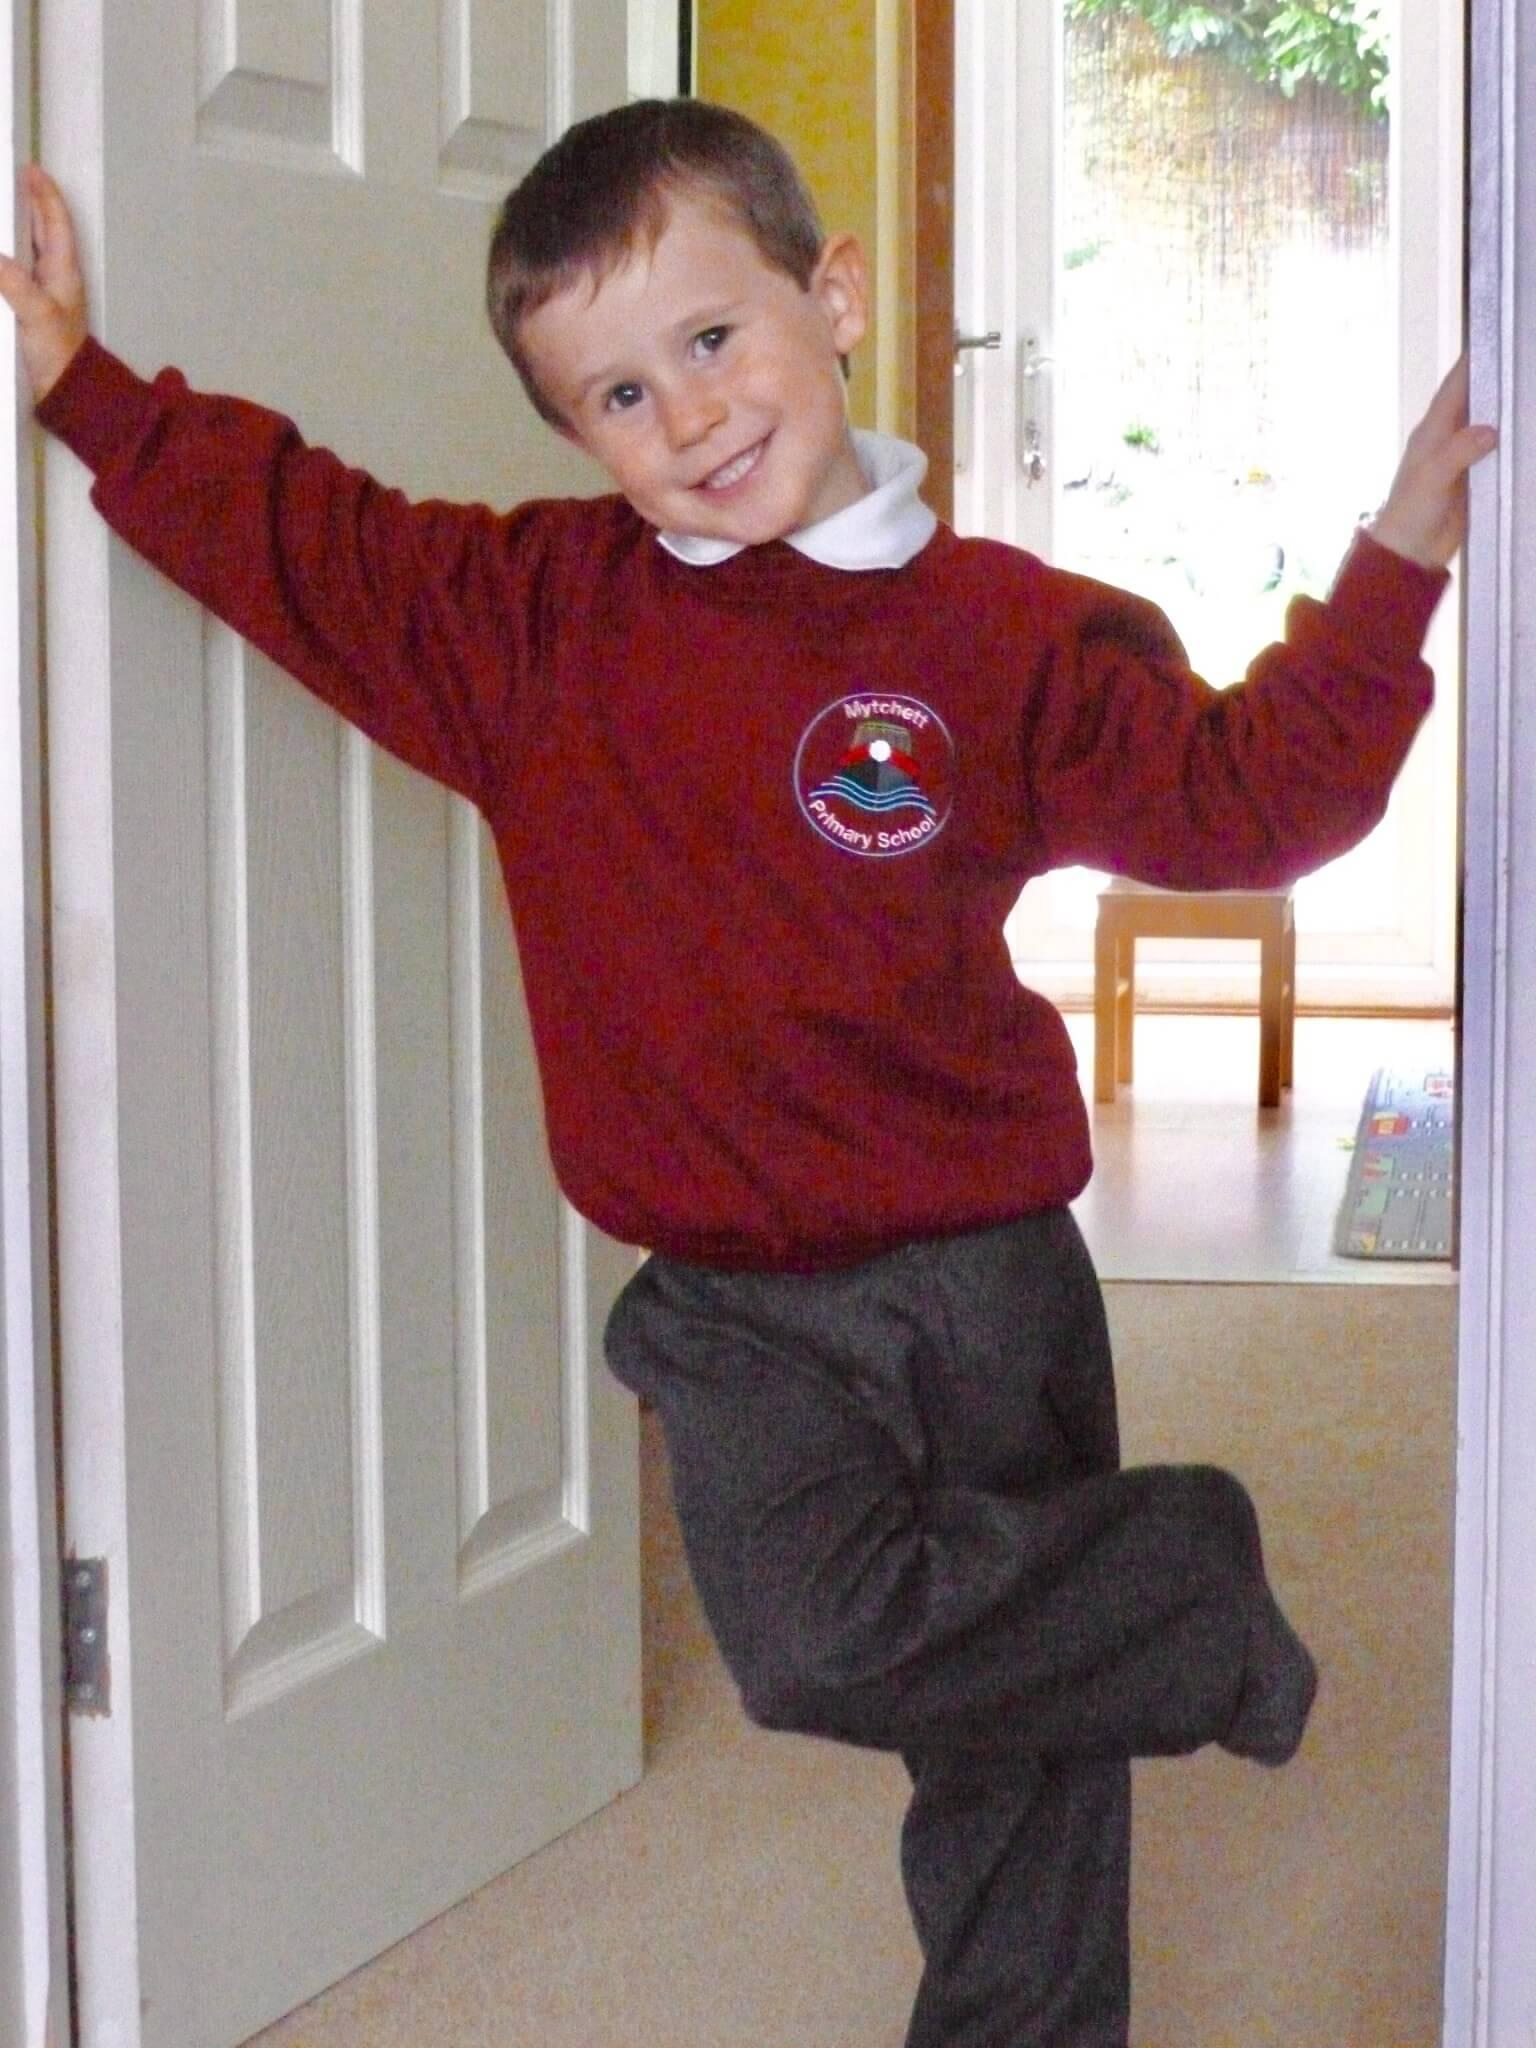 Luke's first day at school